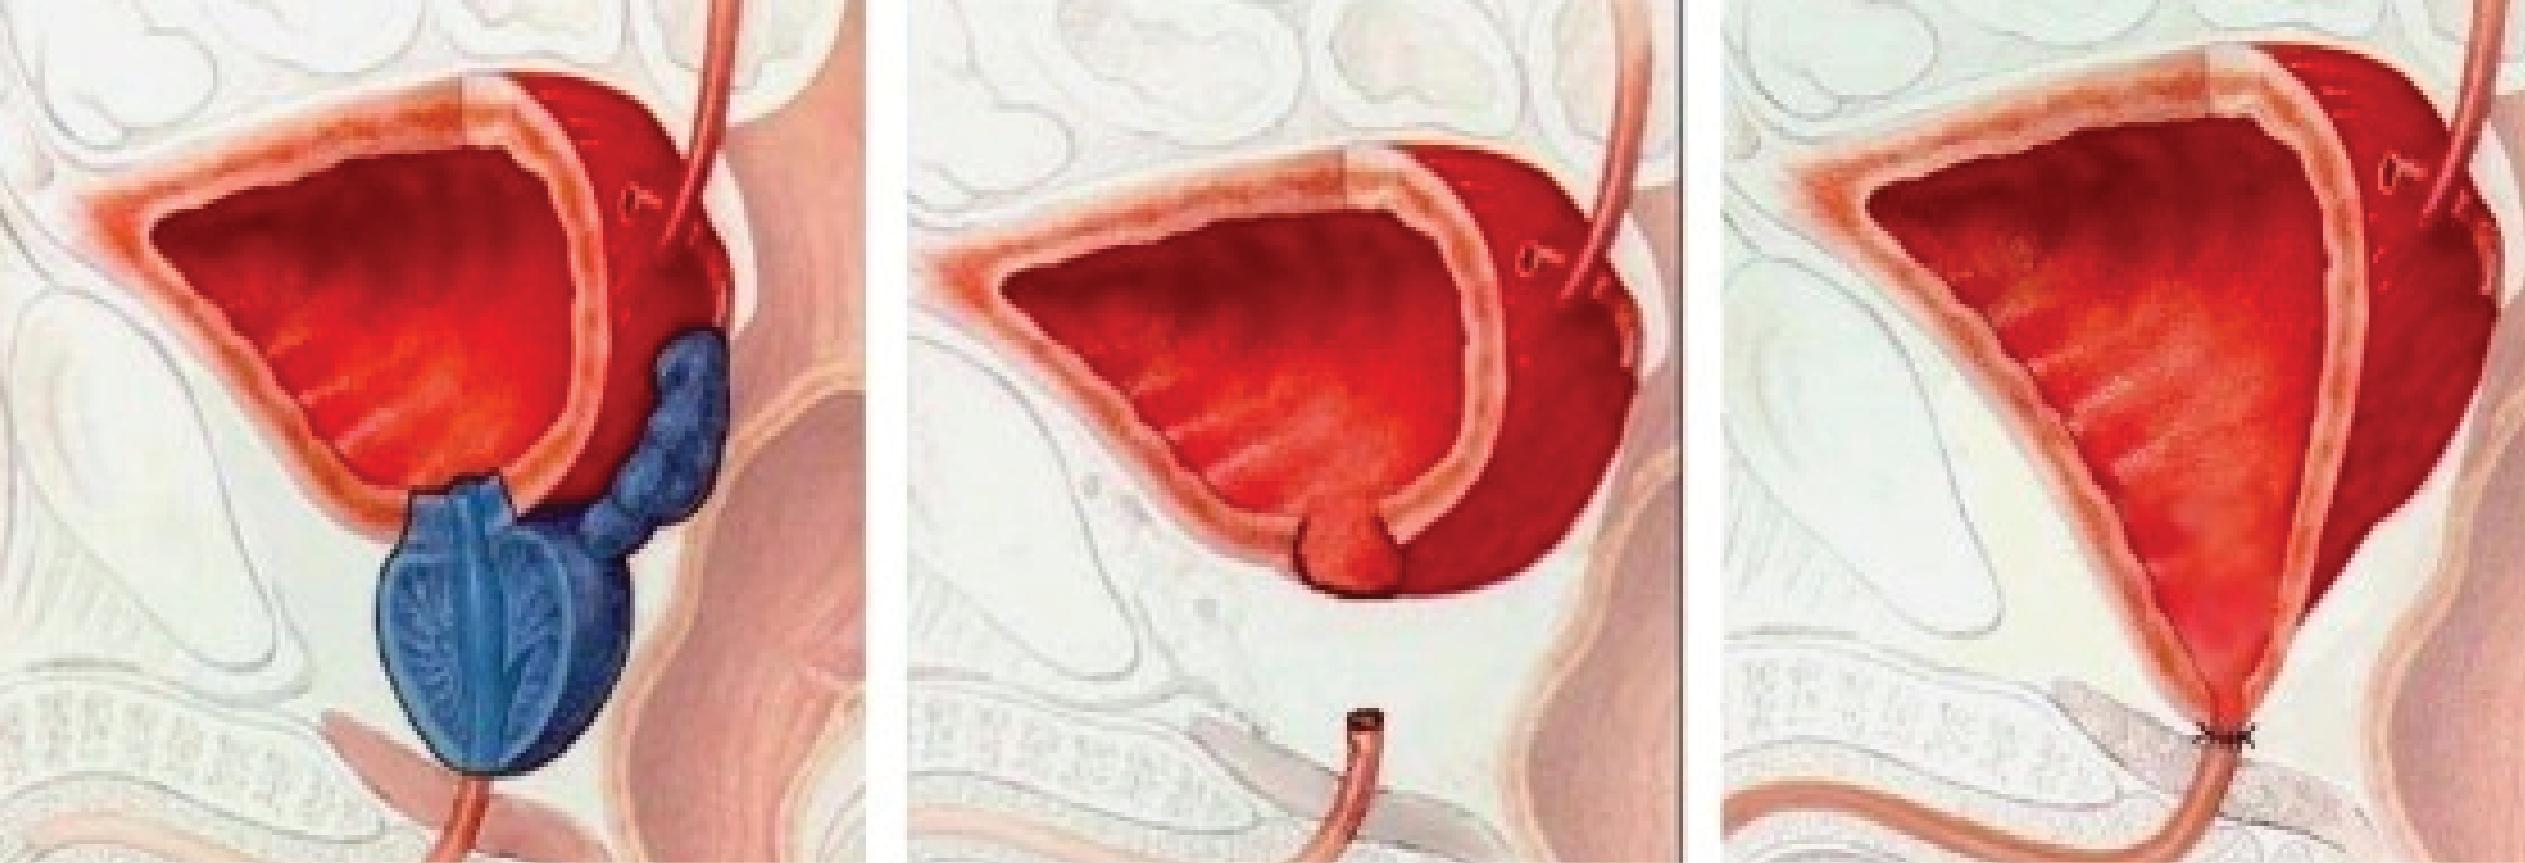 centros de excelencia para la próstata